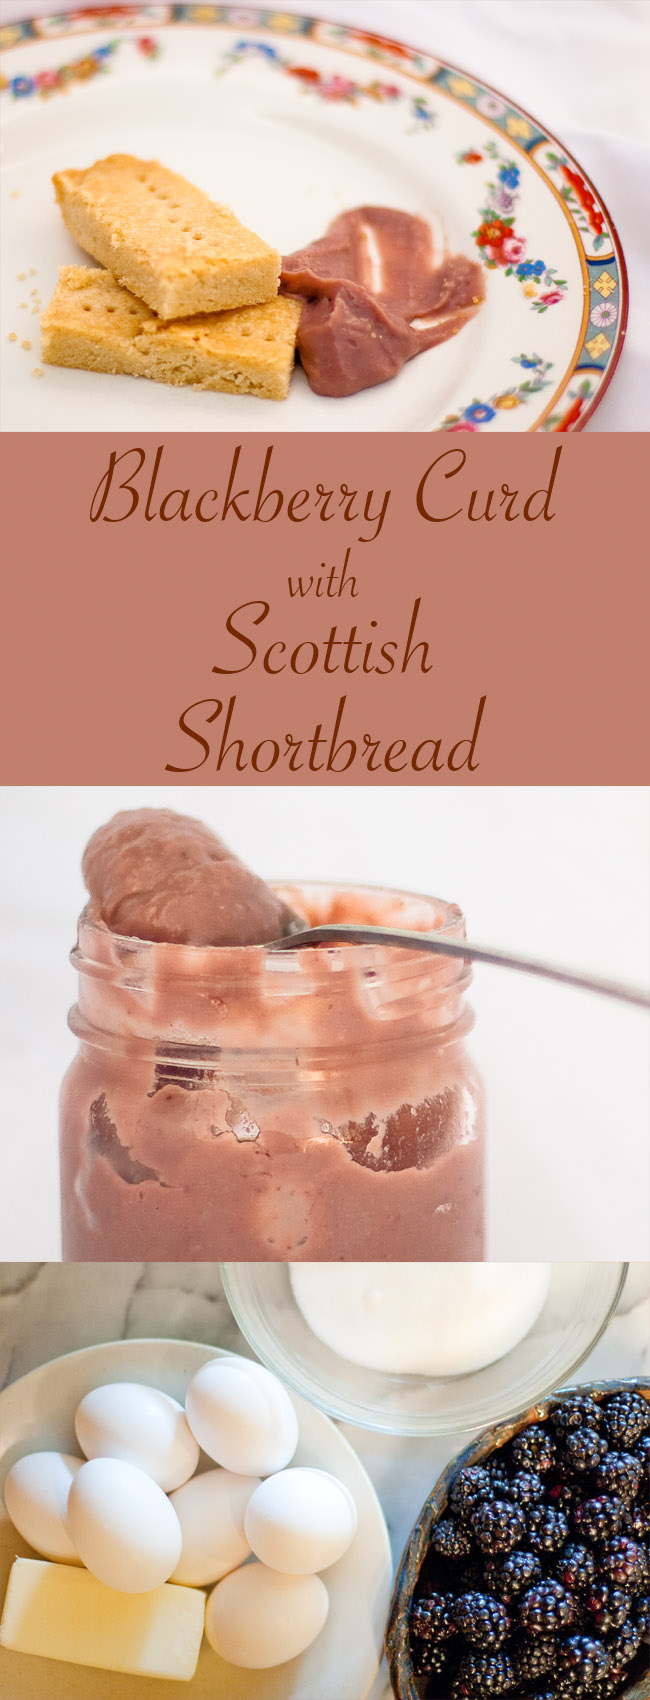 Blackberry Curd with Scottish Shortbread